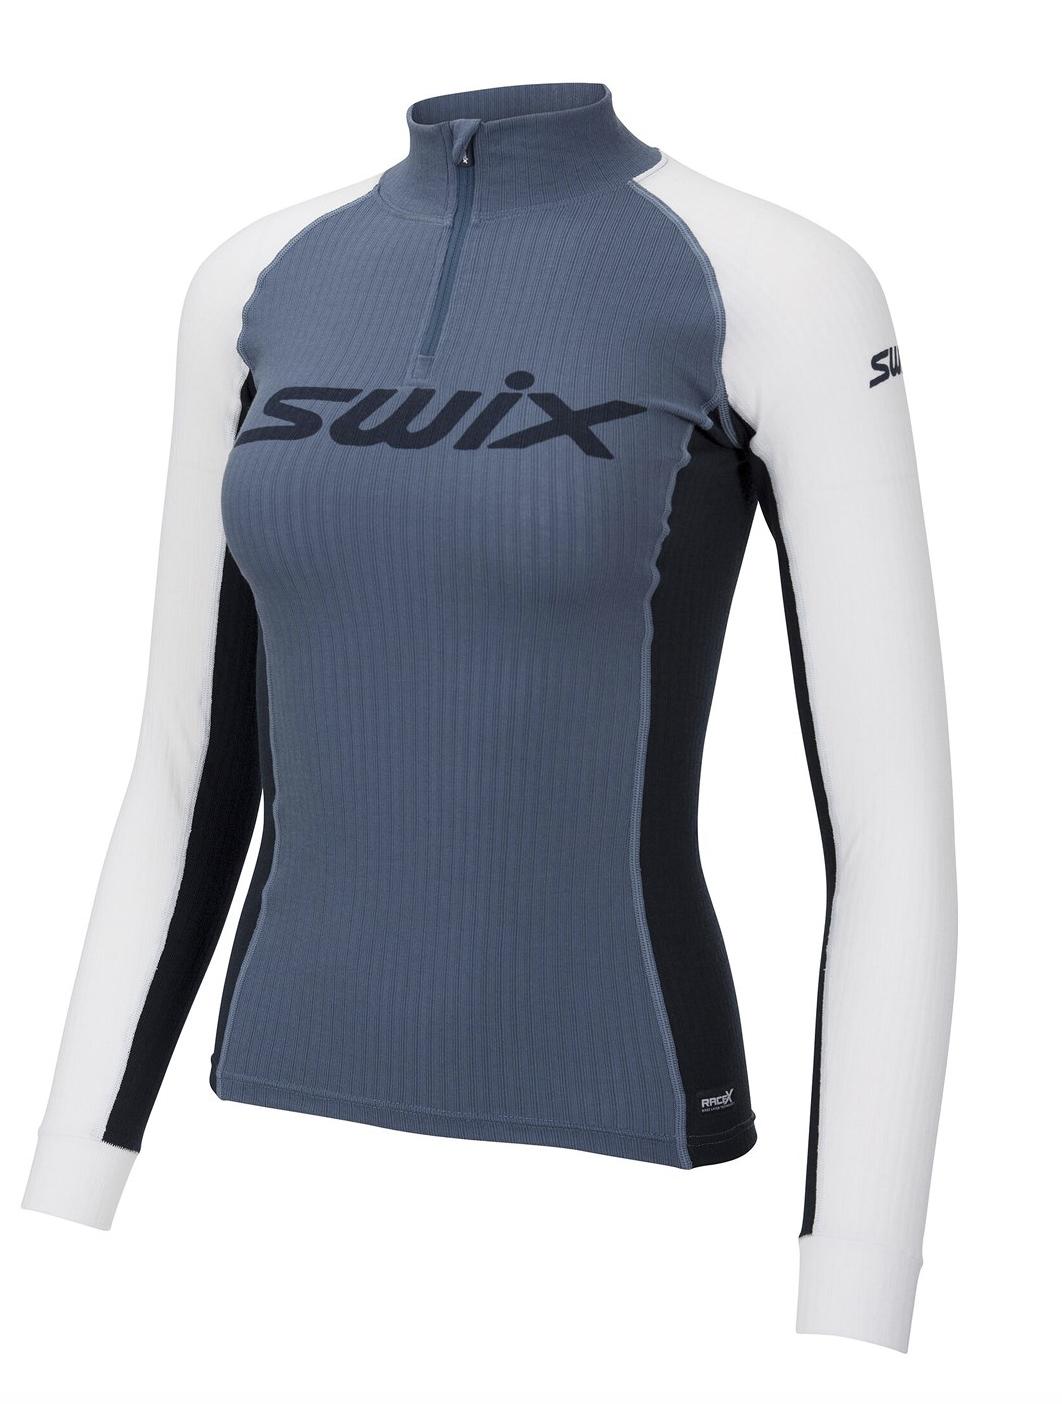 Bilde av Swix  RaceX bodyw halfzip W 72102 Blue Sea